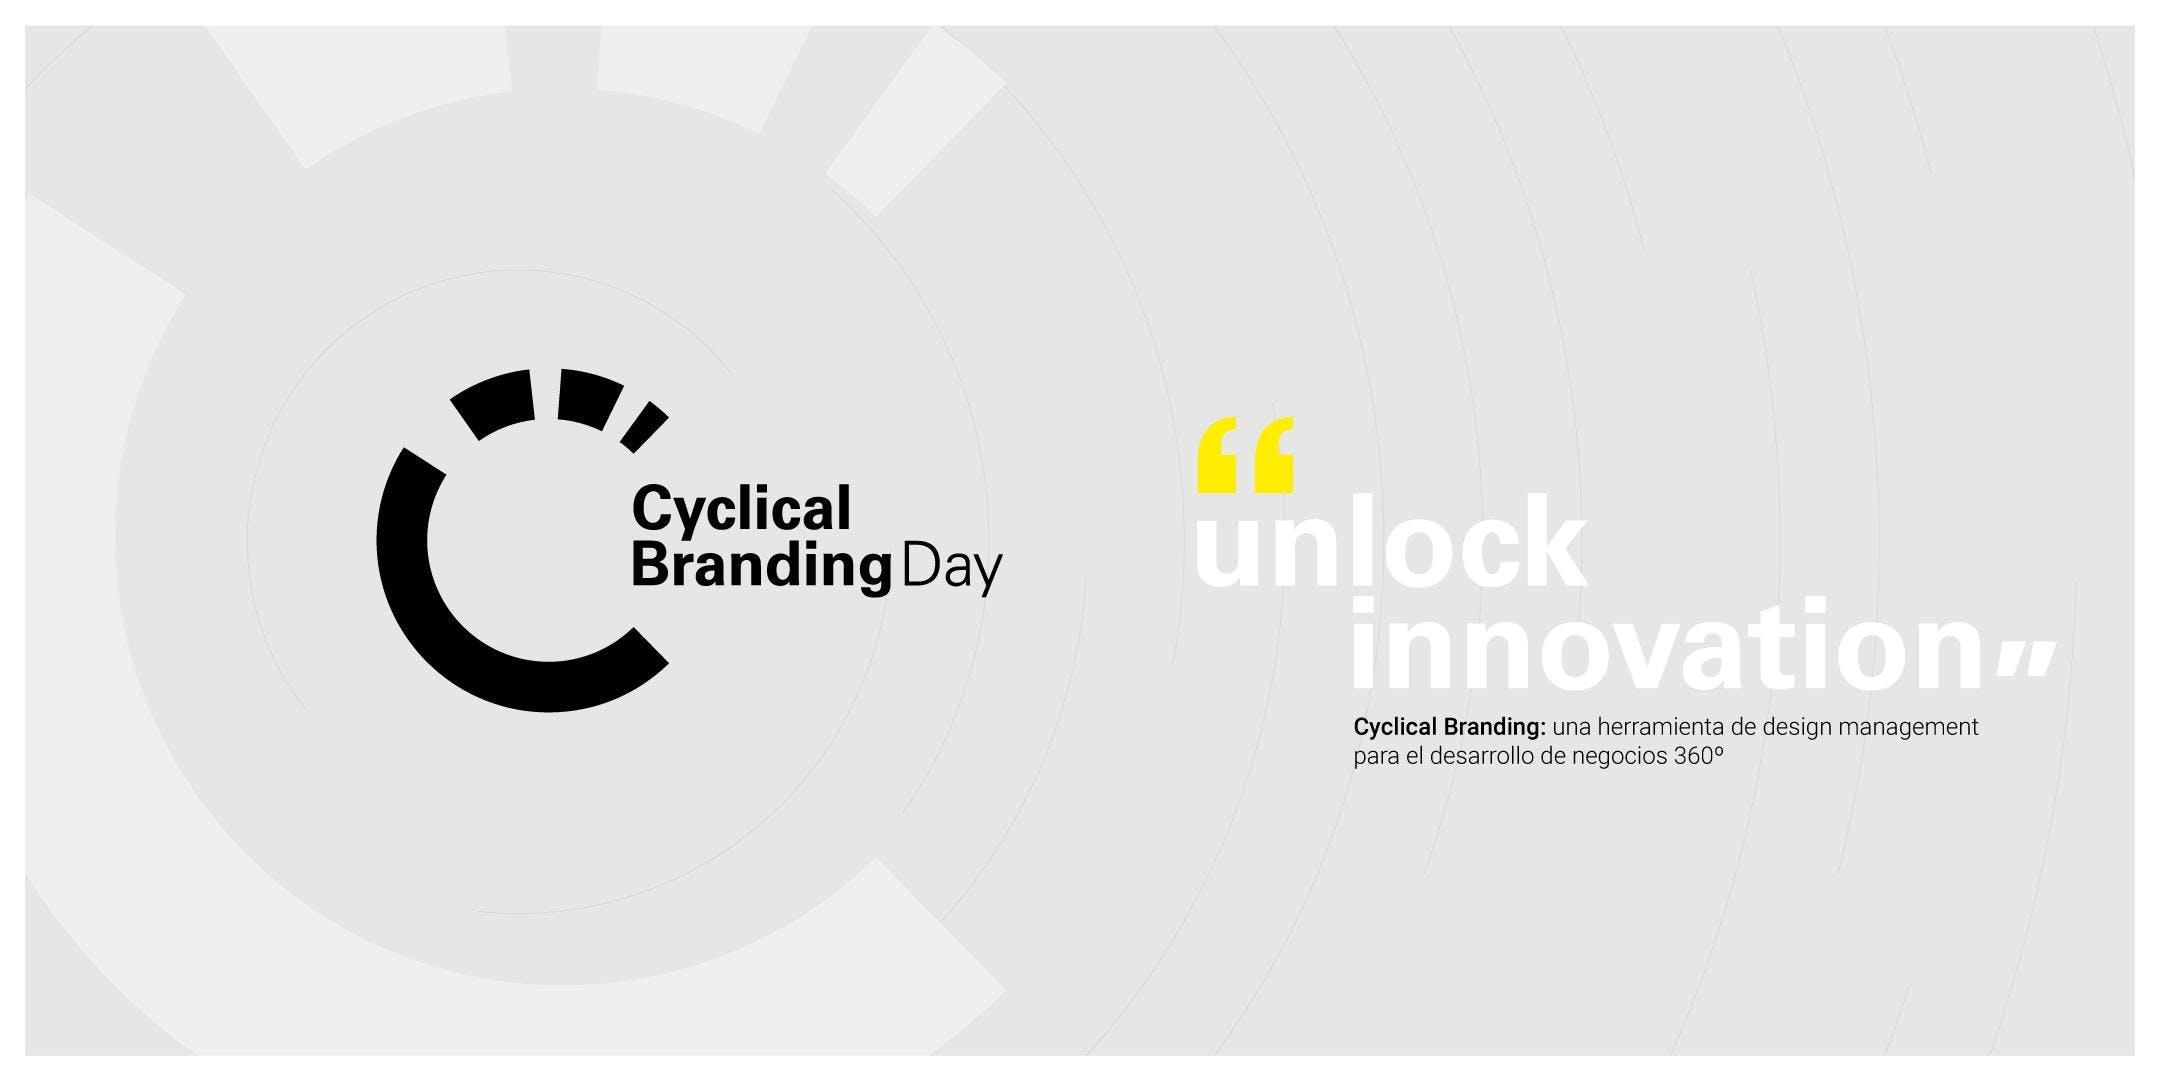 Cyclical Branding® Day | Unlock innnovation